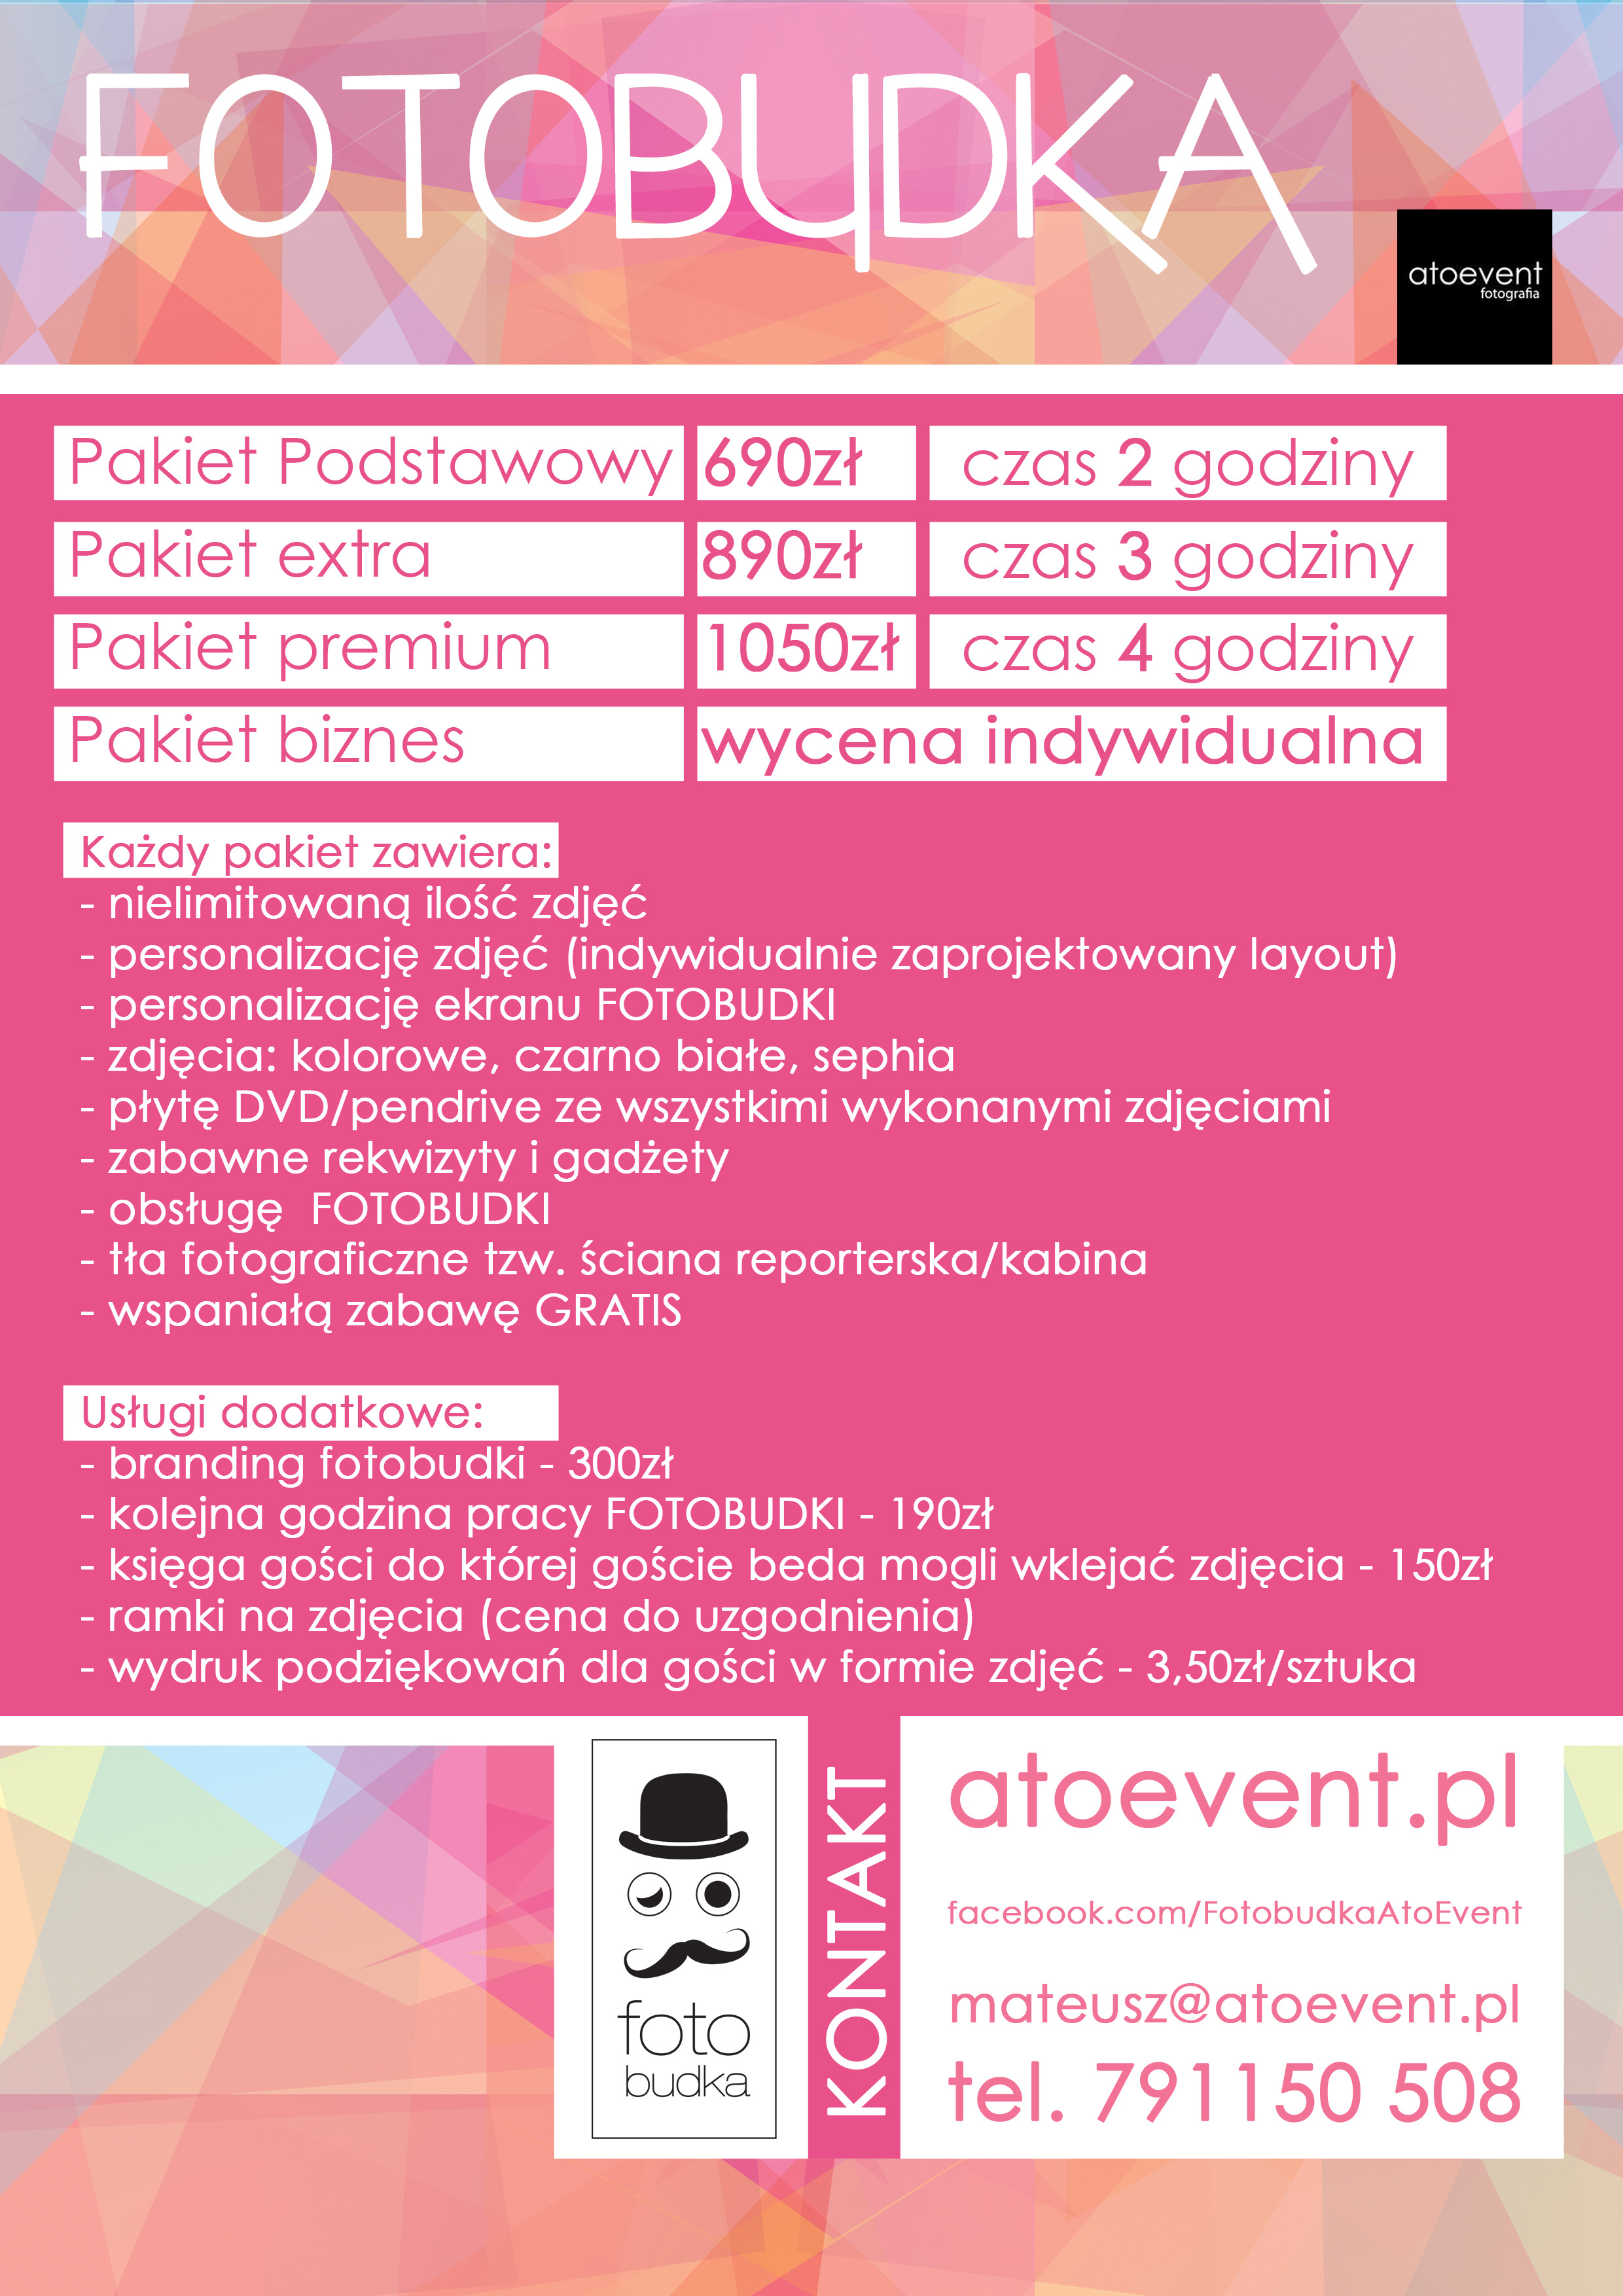 Fotobudka oferta atoevent.pl